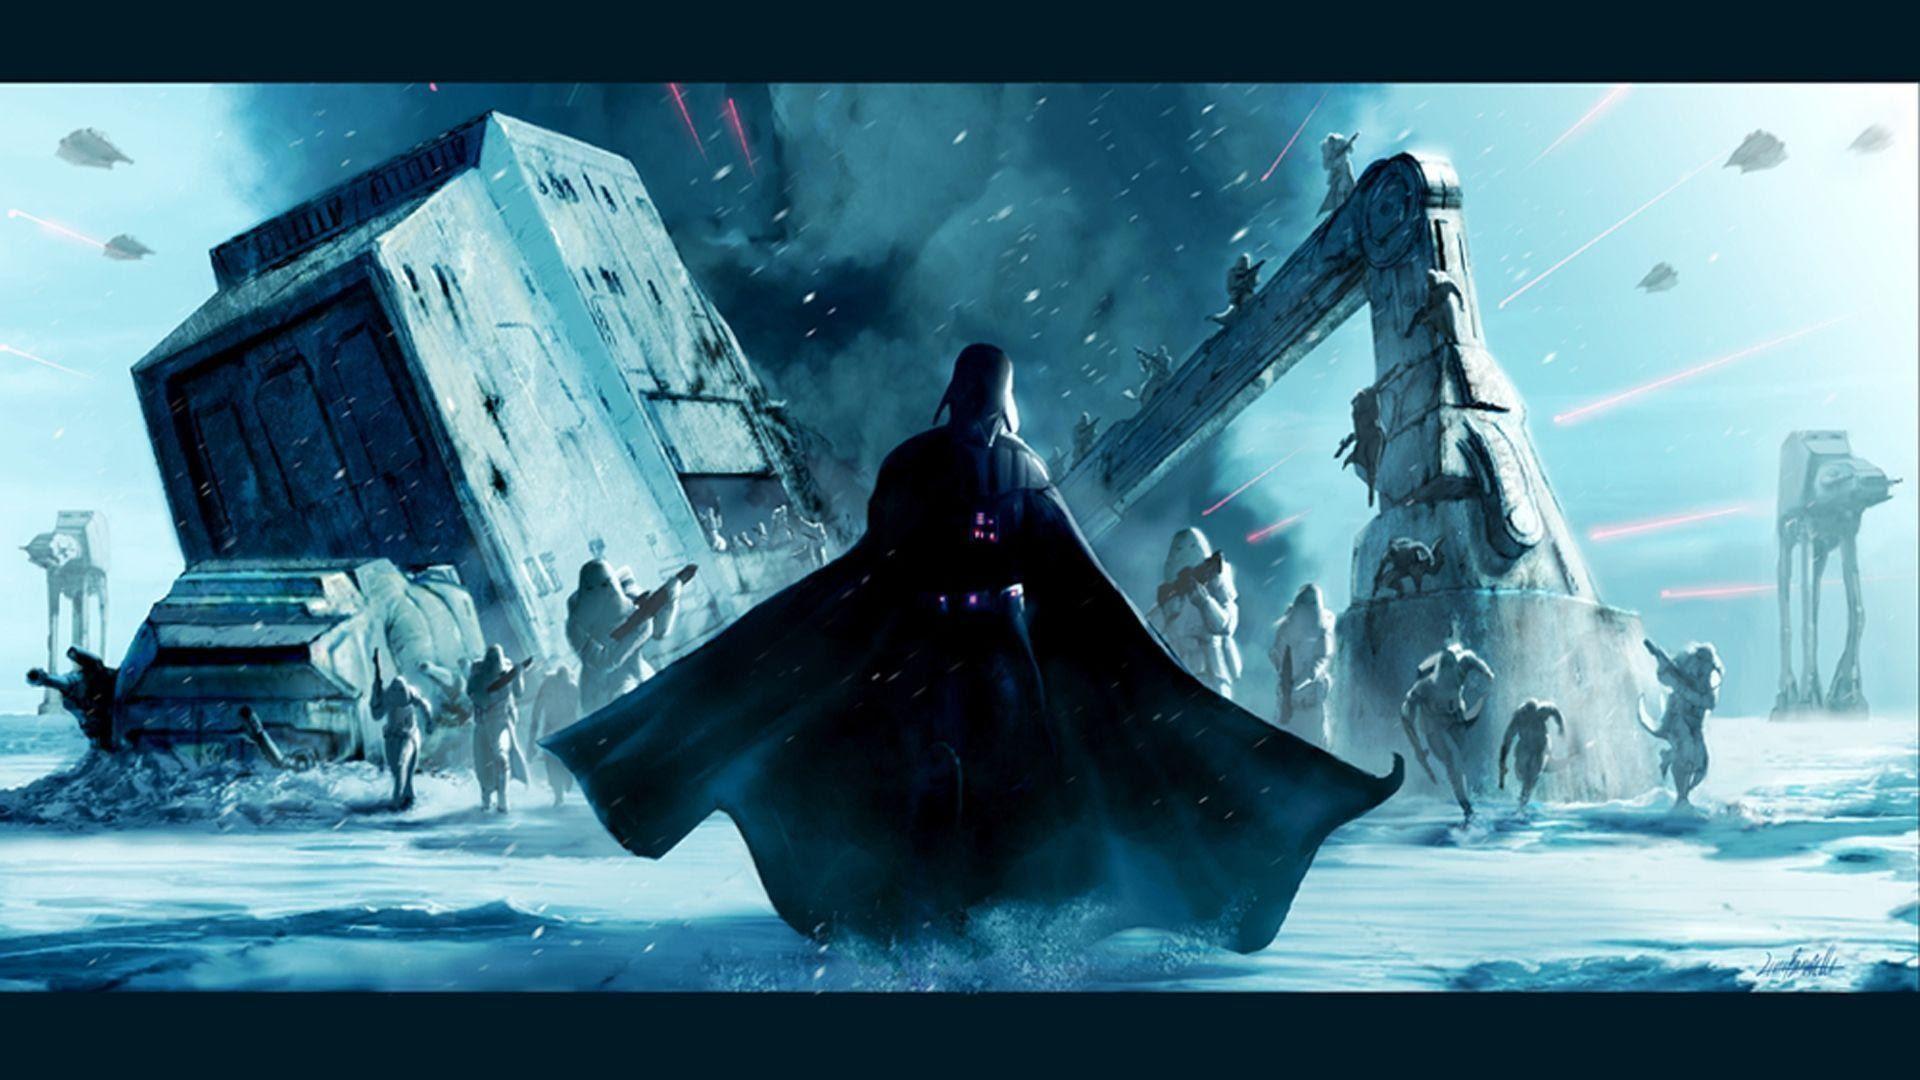 4k Ultra Hd Star Wars Wallpaper 4k Pc Get Images